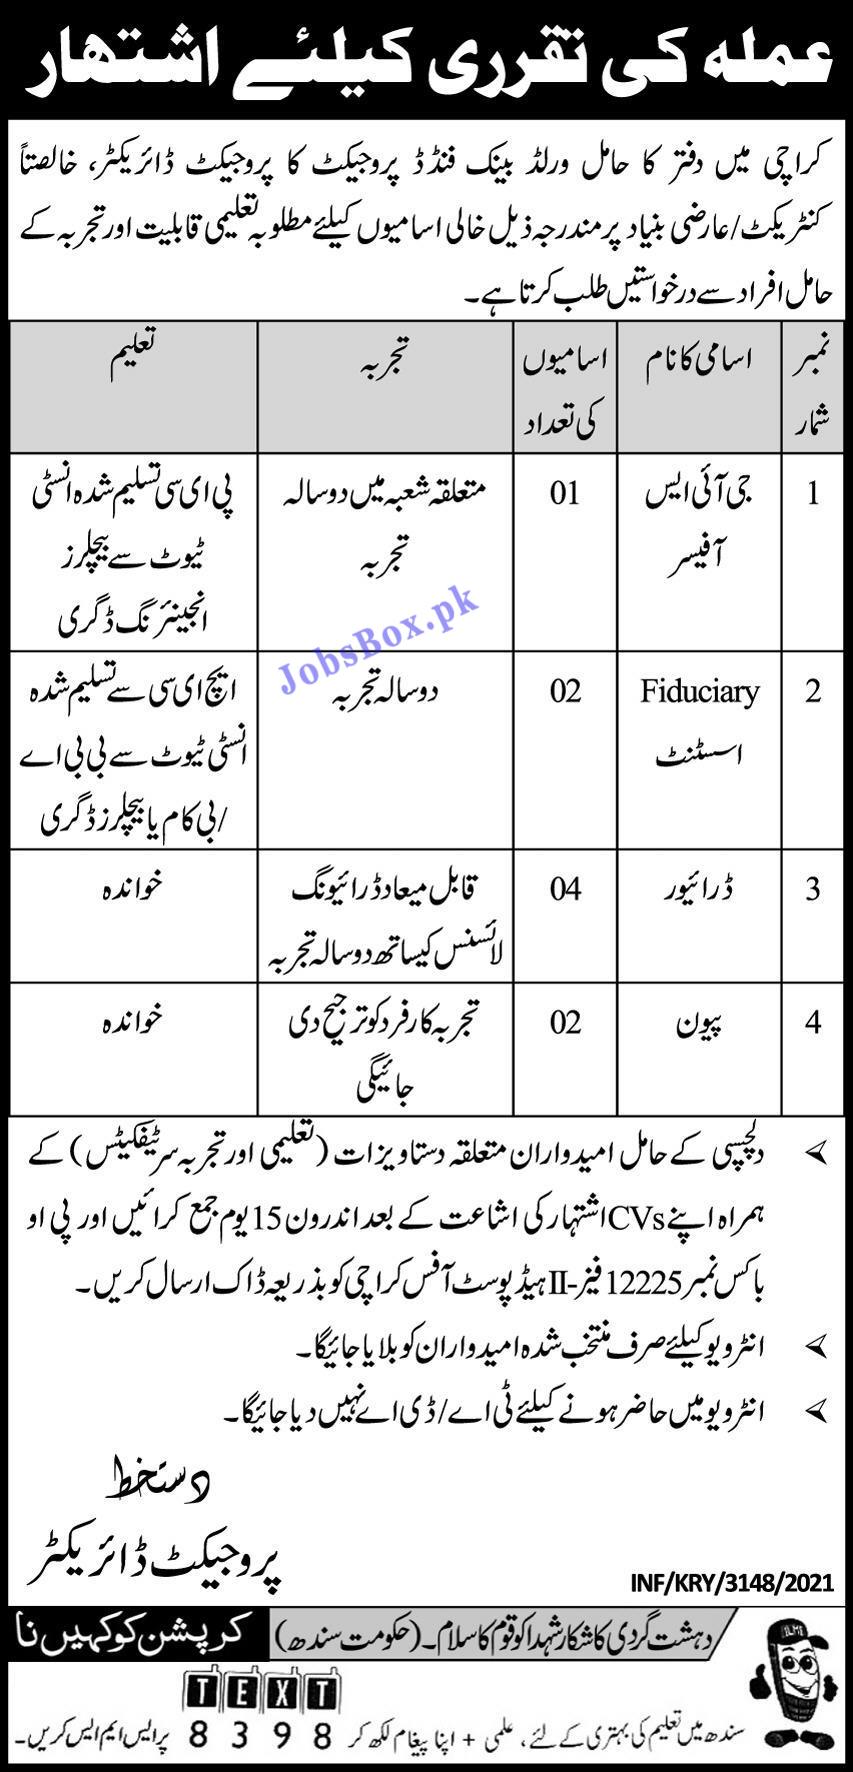 World Bank Funded Project Jobs 2021 – PO Box 12225 Karachi Jobs